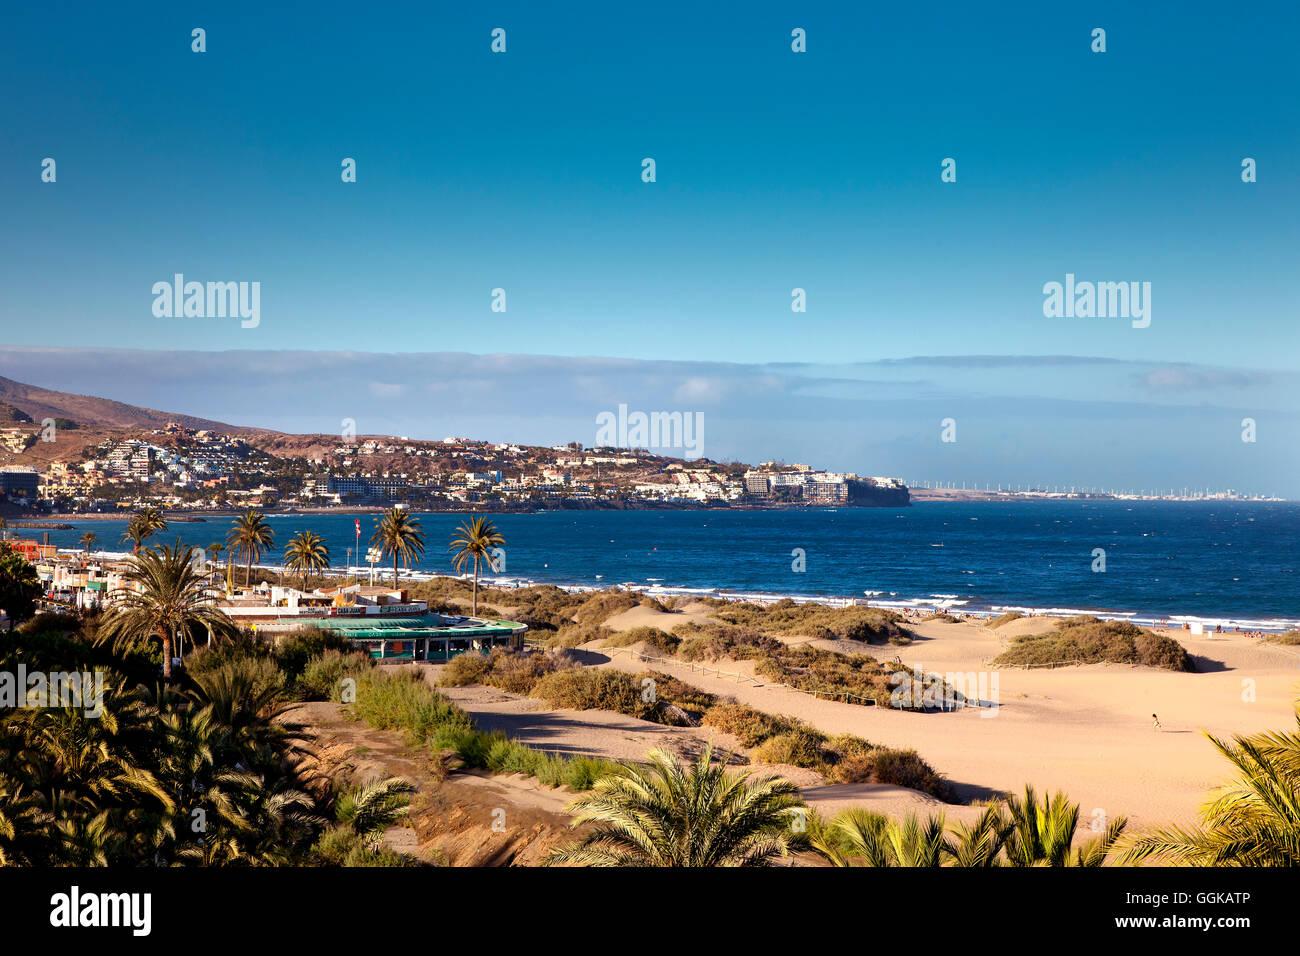 Maspalomas Dünen, Playa de Ingles, Gran Canaria, Kanarische Inseln, Spanien Stockbild